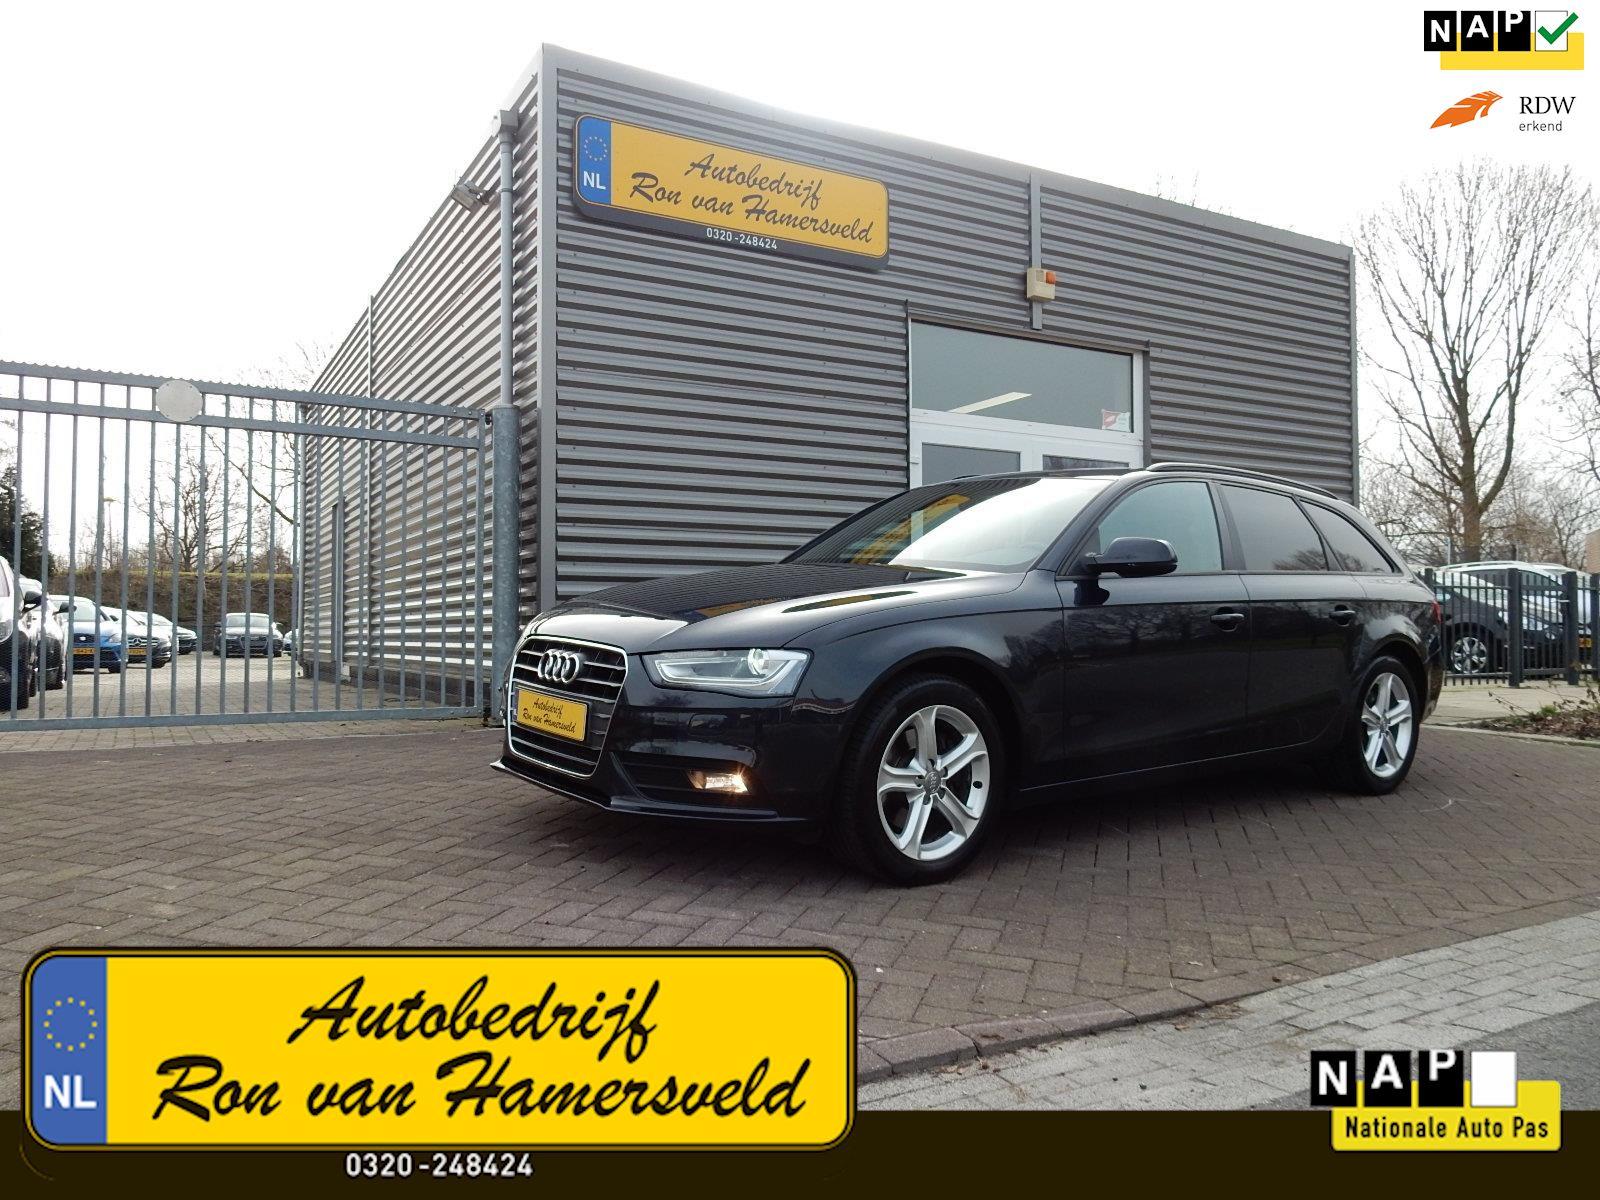 Audi A4 Avant occasion - Ron van Hamersveld BV